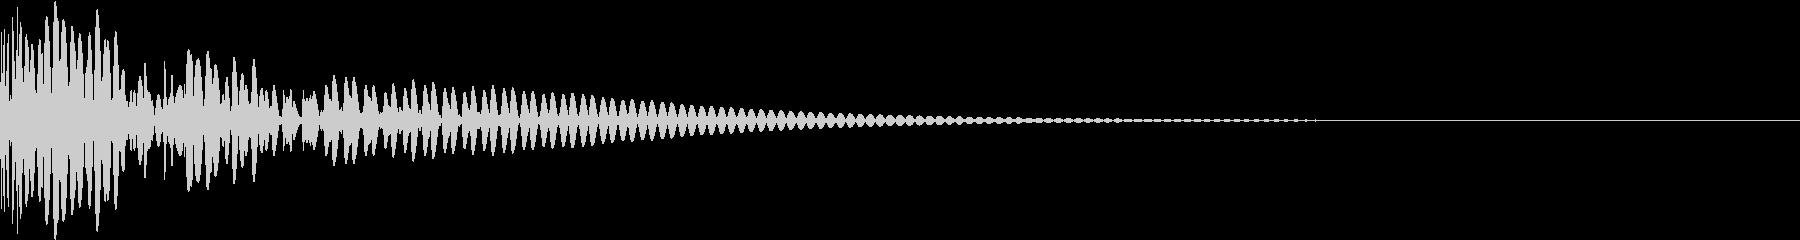 DTM Kick 101 オリジナル音源の未再生の波形